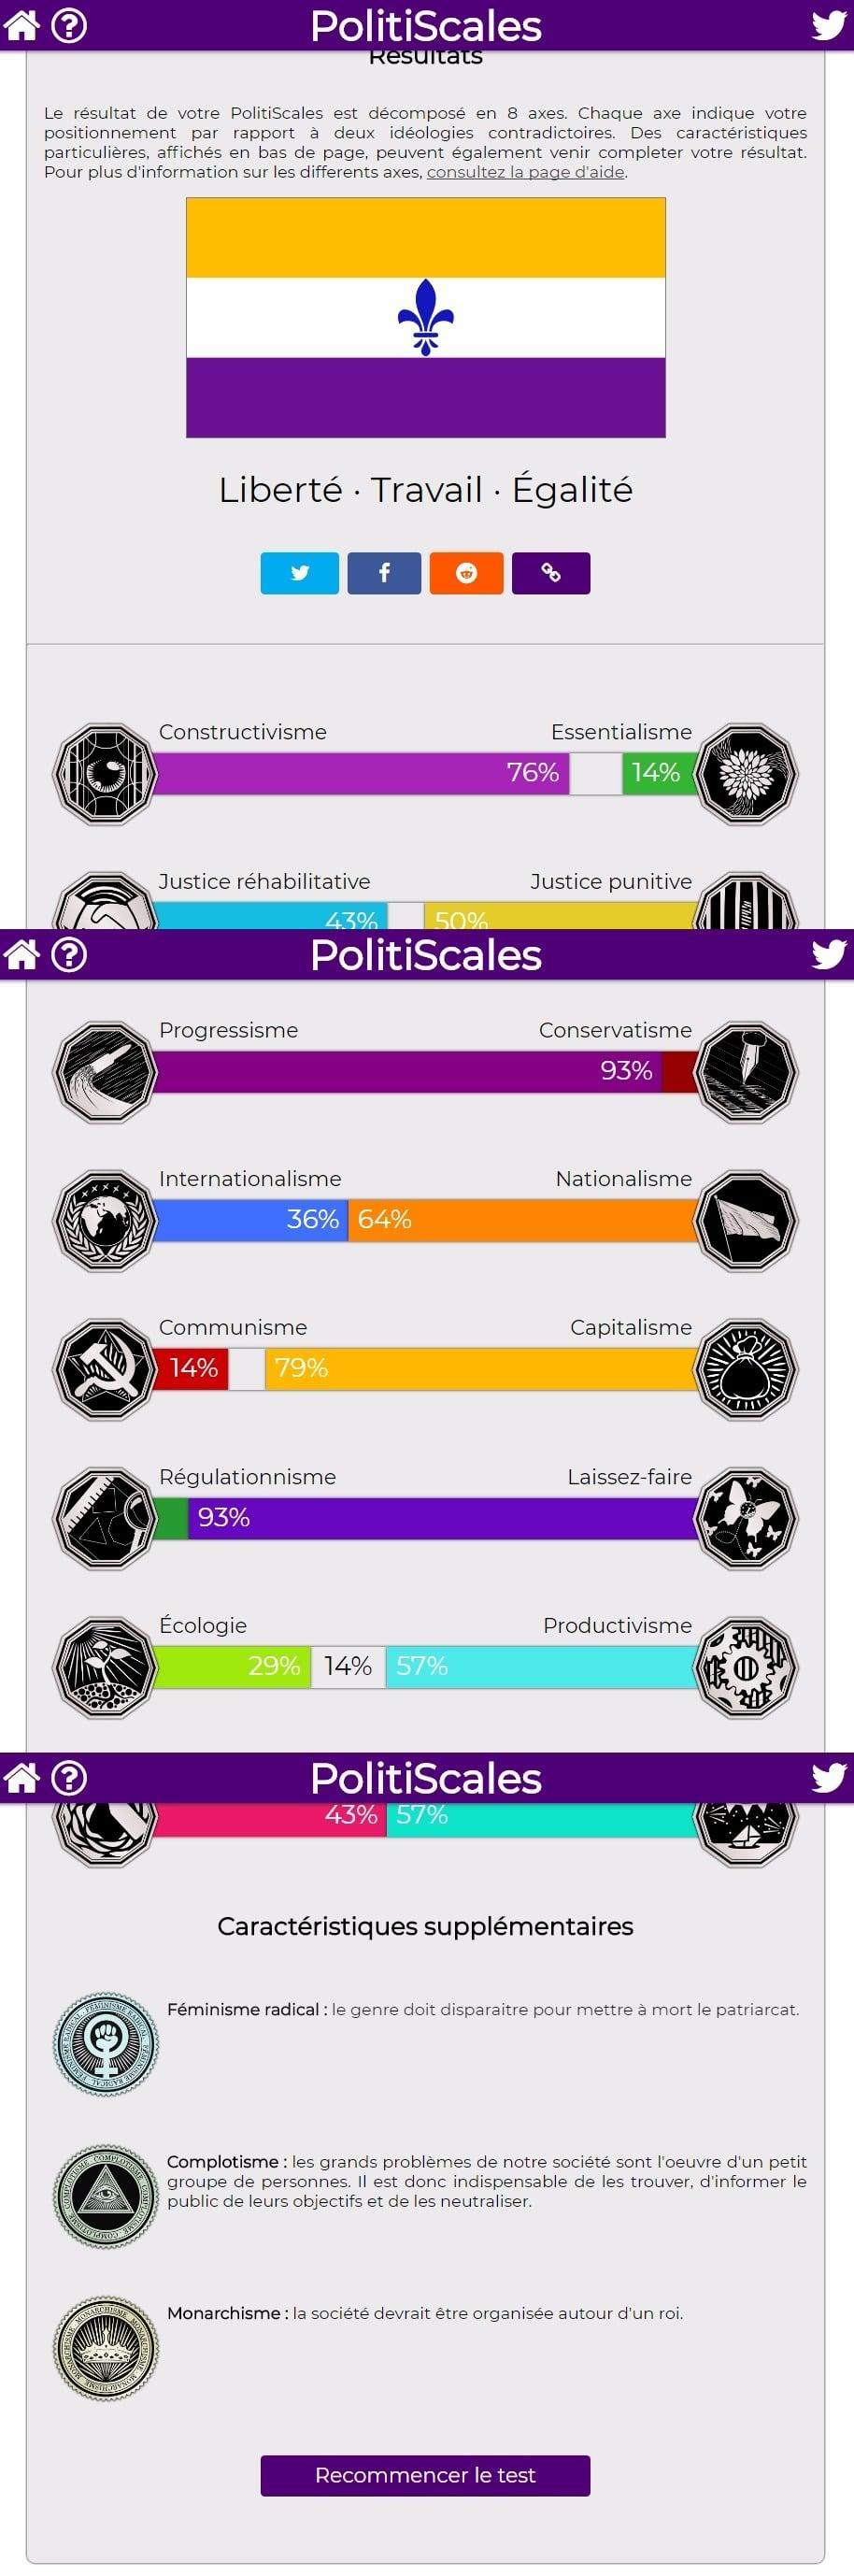 politiscales-resultats